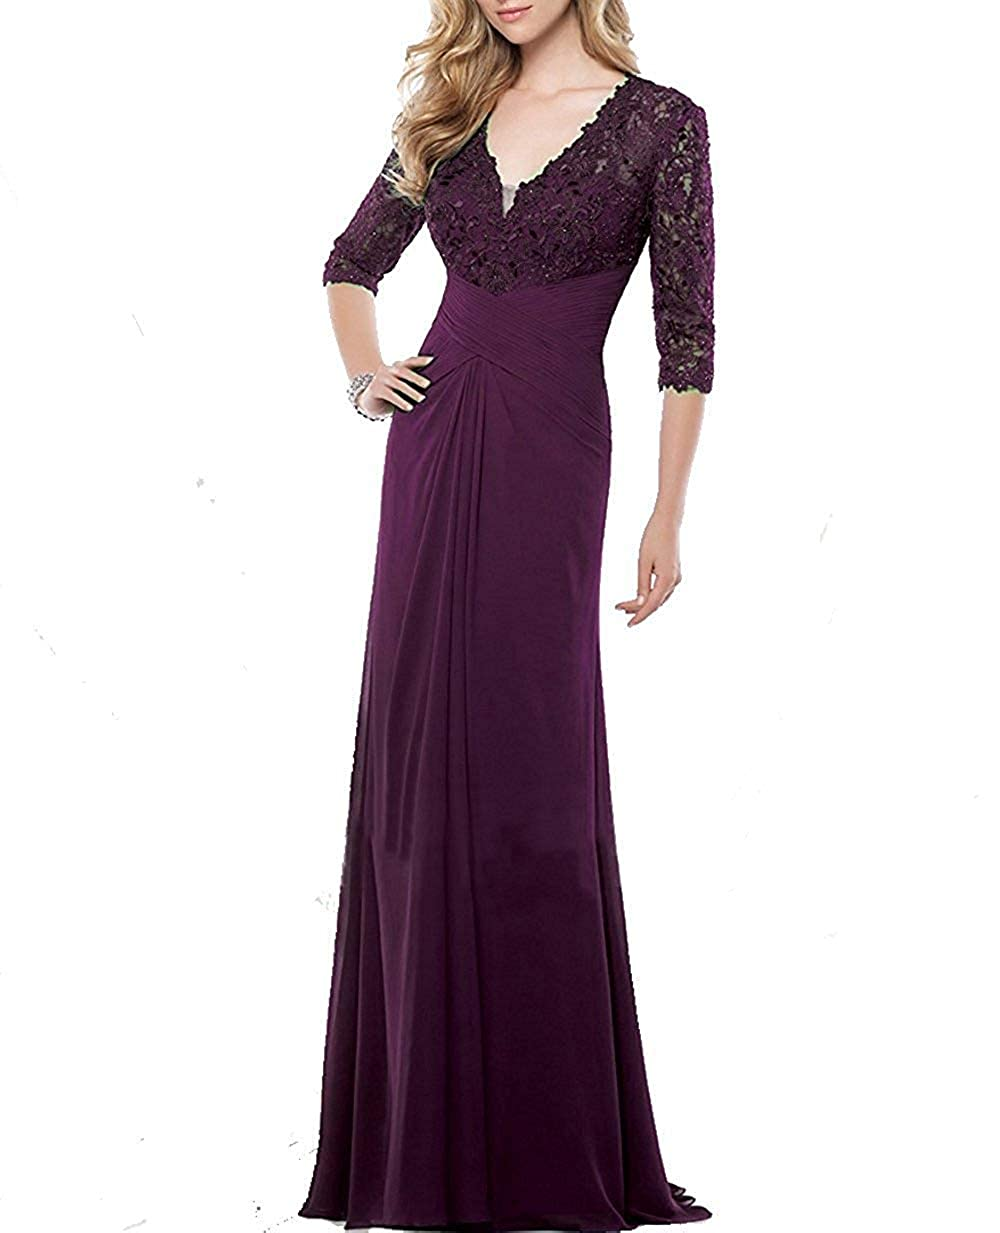 DressyMe Womens Grace Evening Dresses 1//2 Sleeves V-Neck A-Line Lace Prom Dress